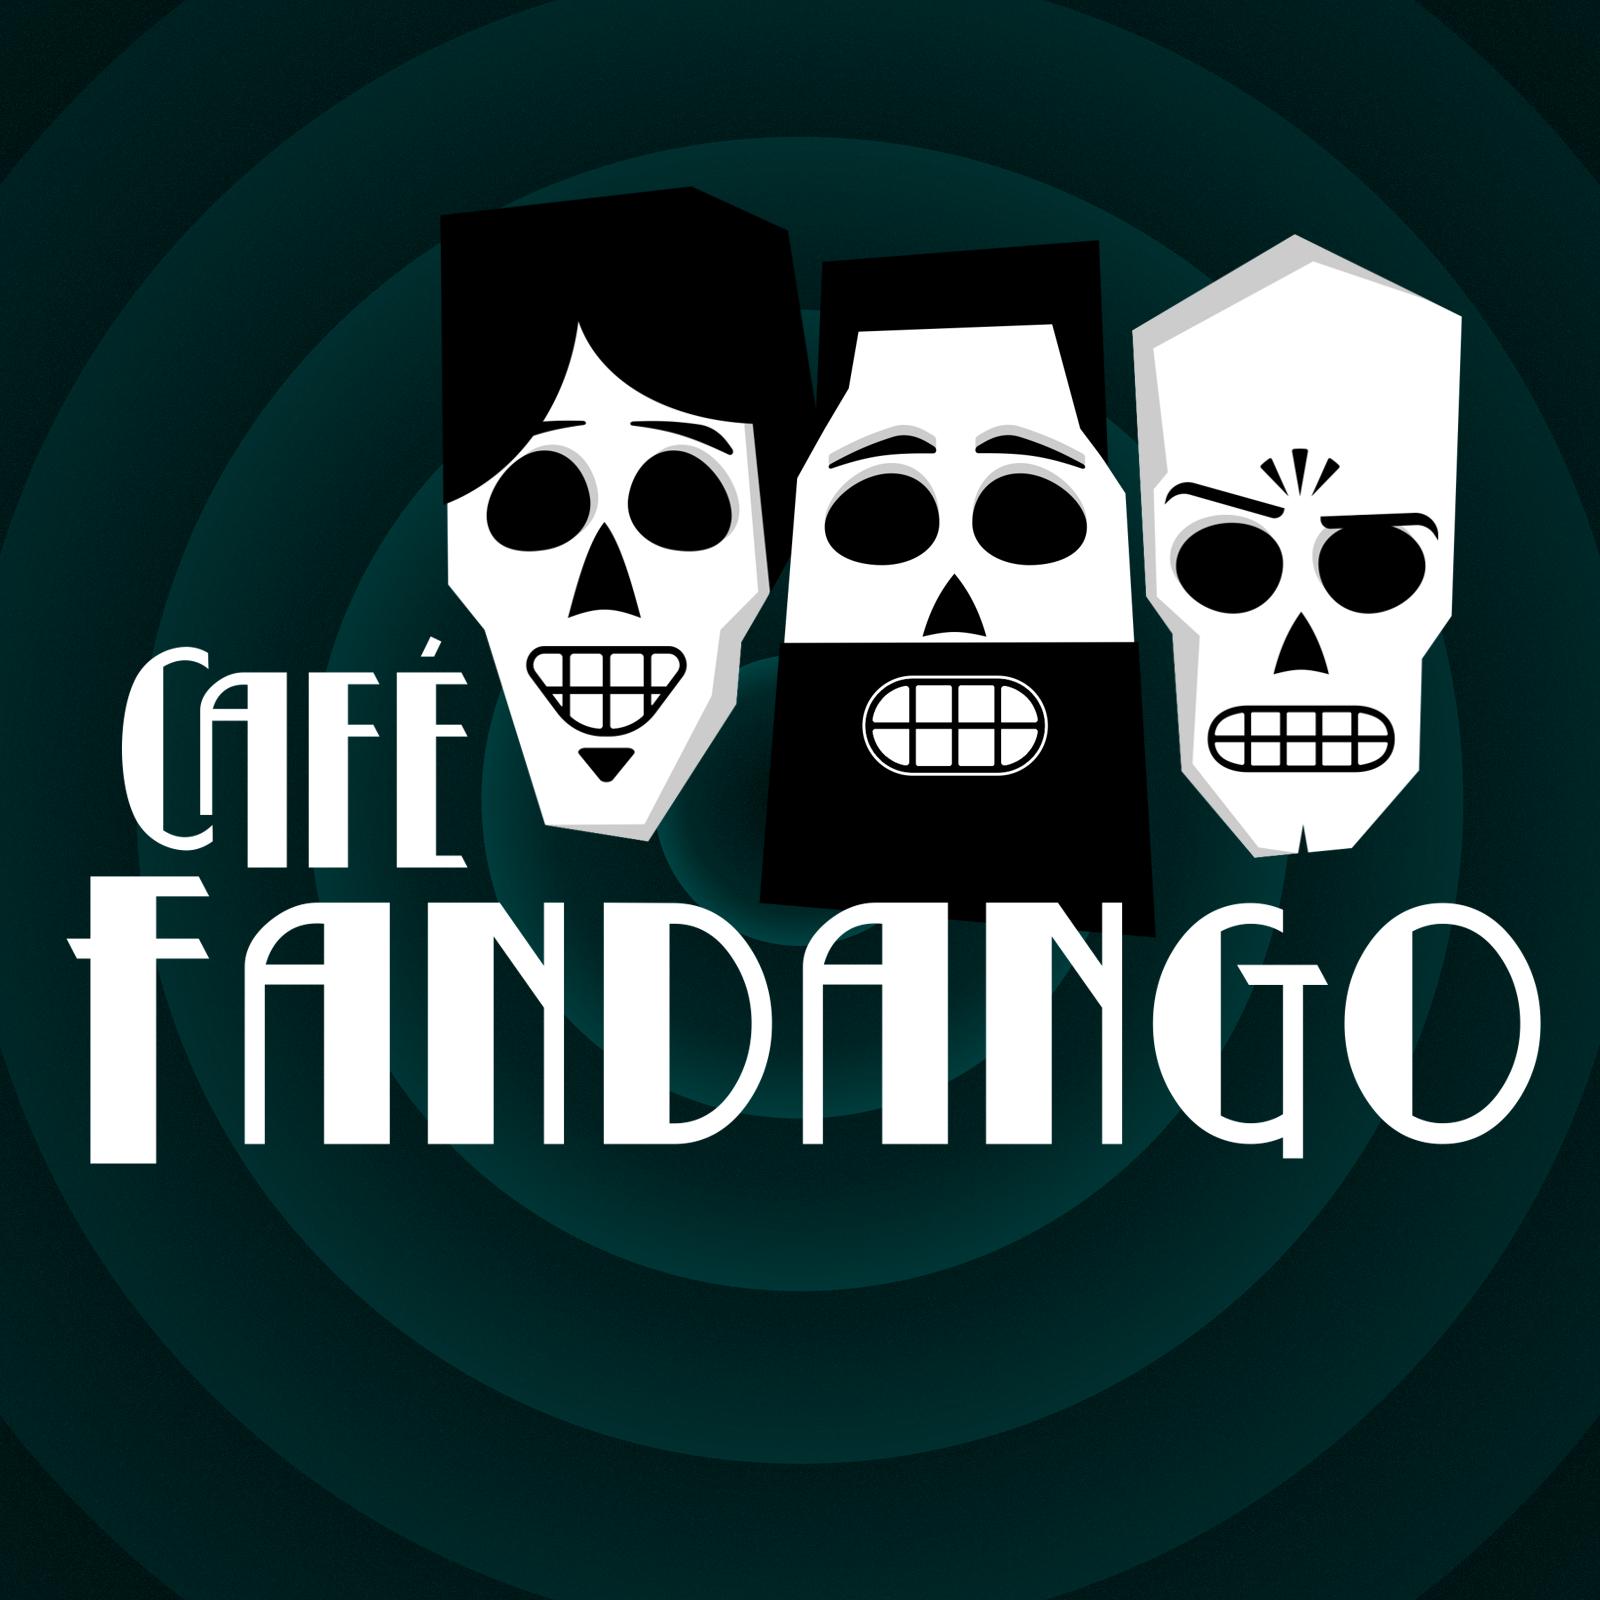 Cafe Fandango